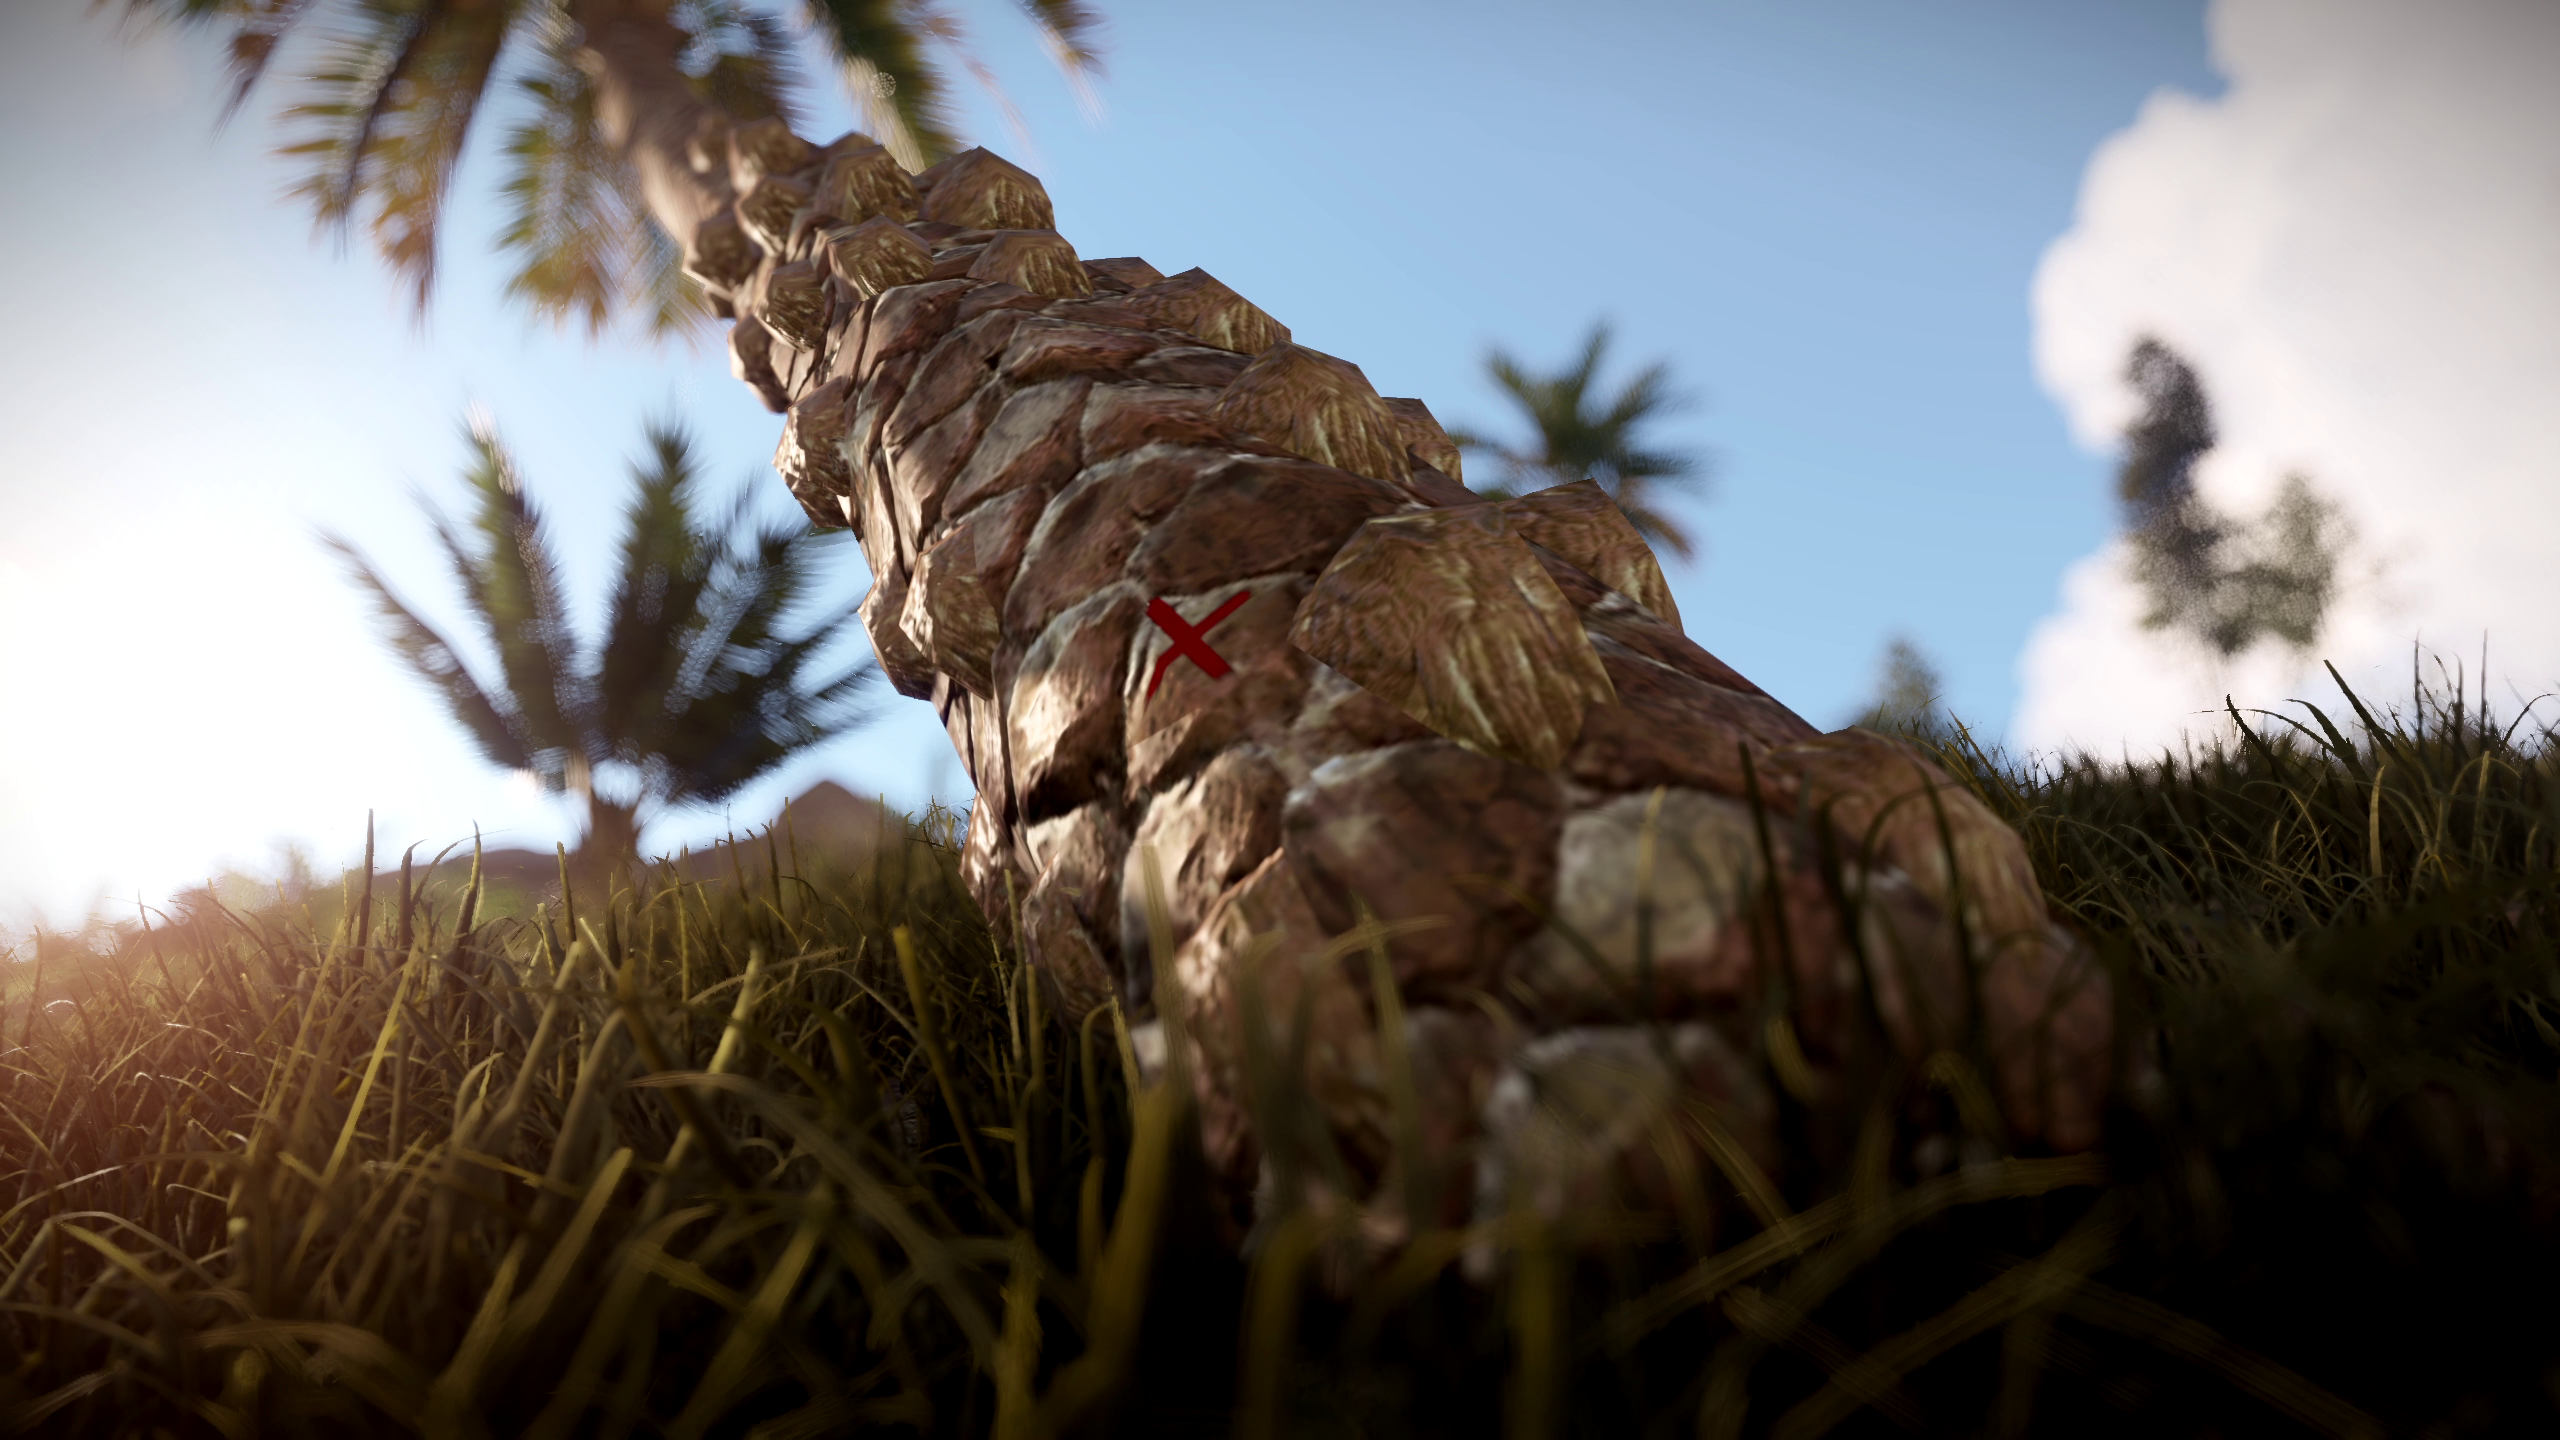 The Tree Fix Update